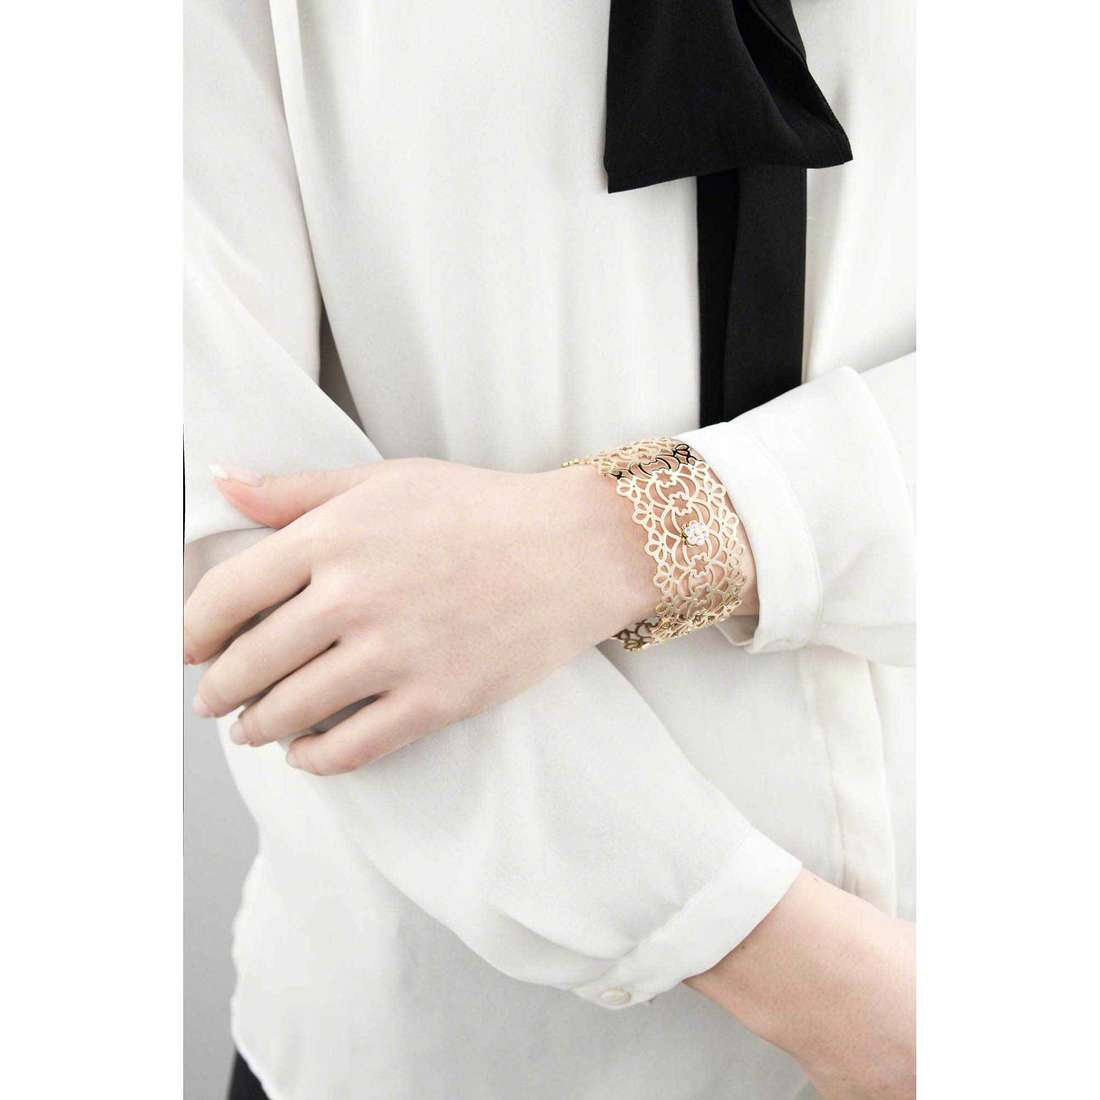 Morellato bracciali Kaleido donna SADY04 indosso